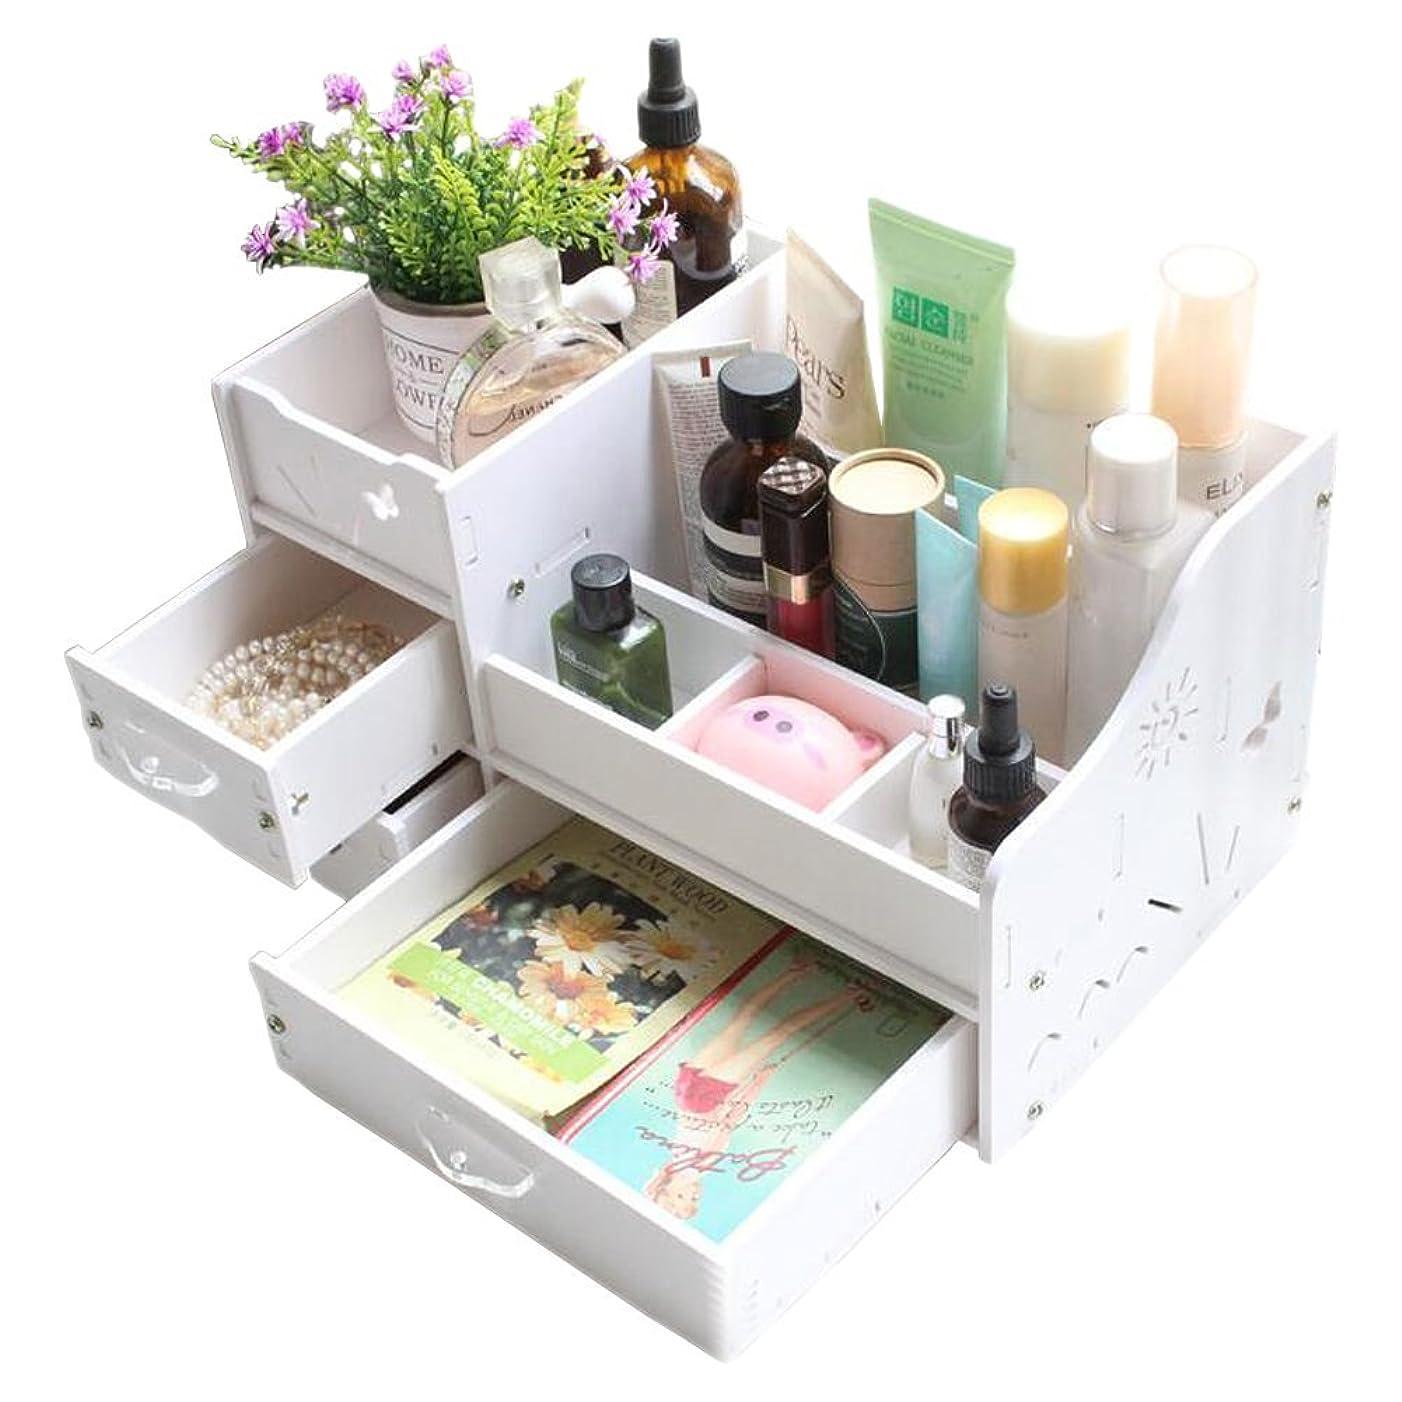 INANA 収納ボックス メイクボックス コスメボックス ジュエリー ボックス アクセサリー ケース 収納 雑貨 小物入れ 化粧道具入れ 化粧品収納 便利 (ホワイト)